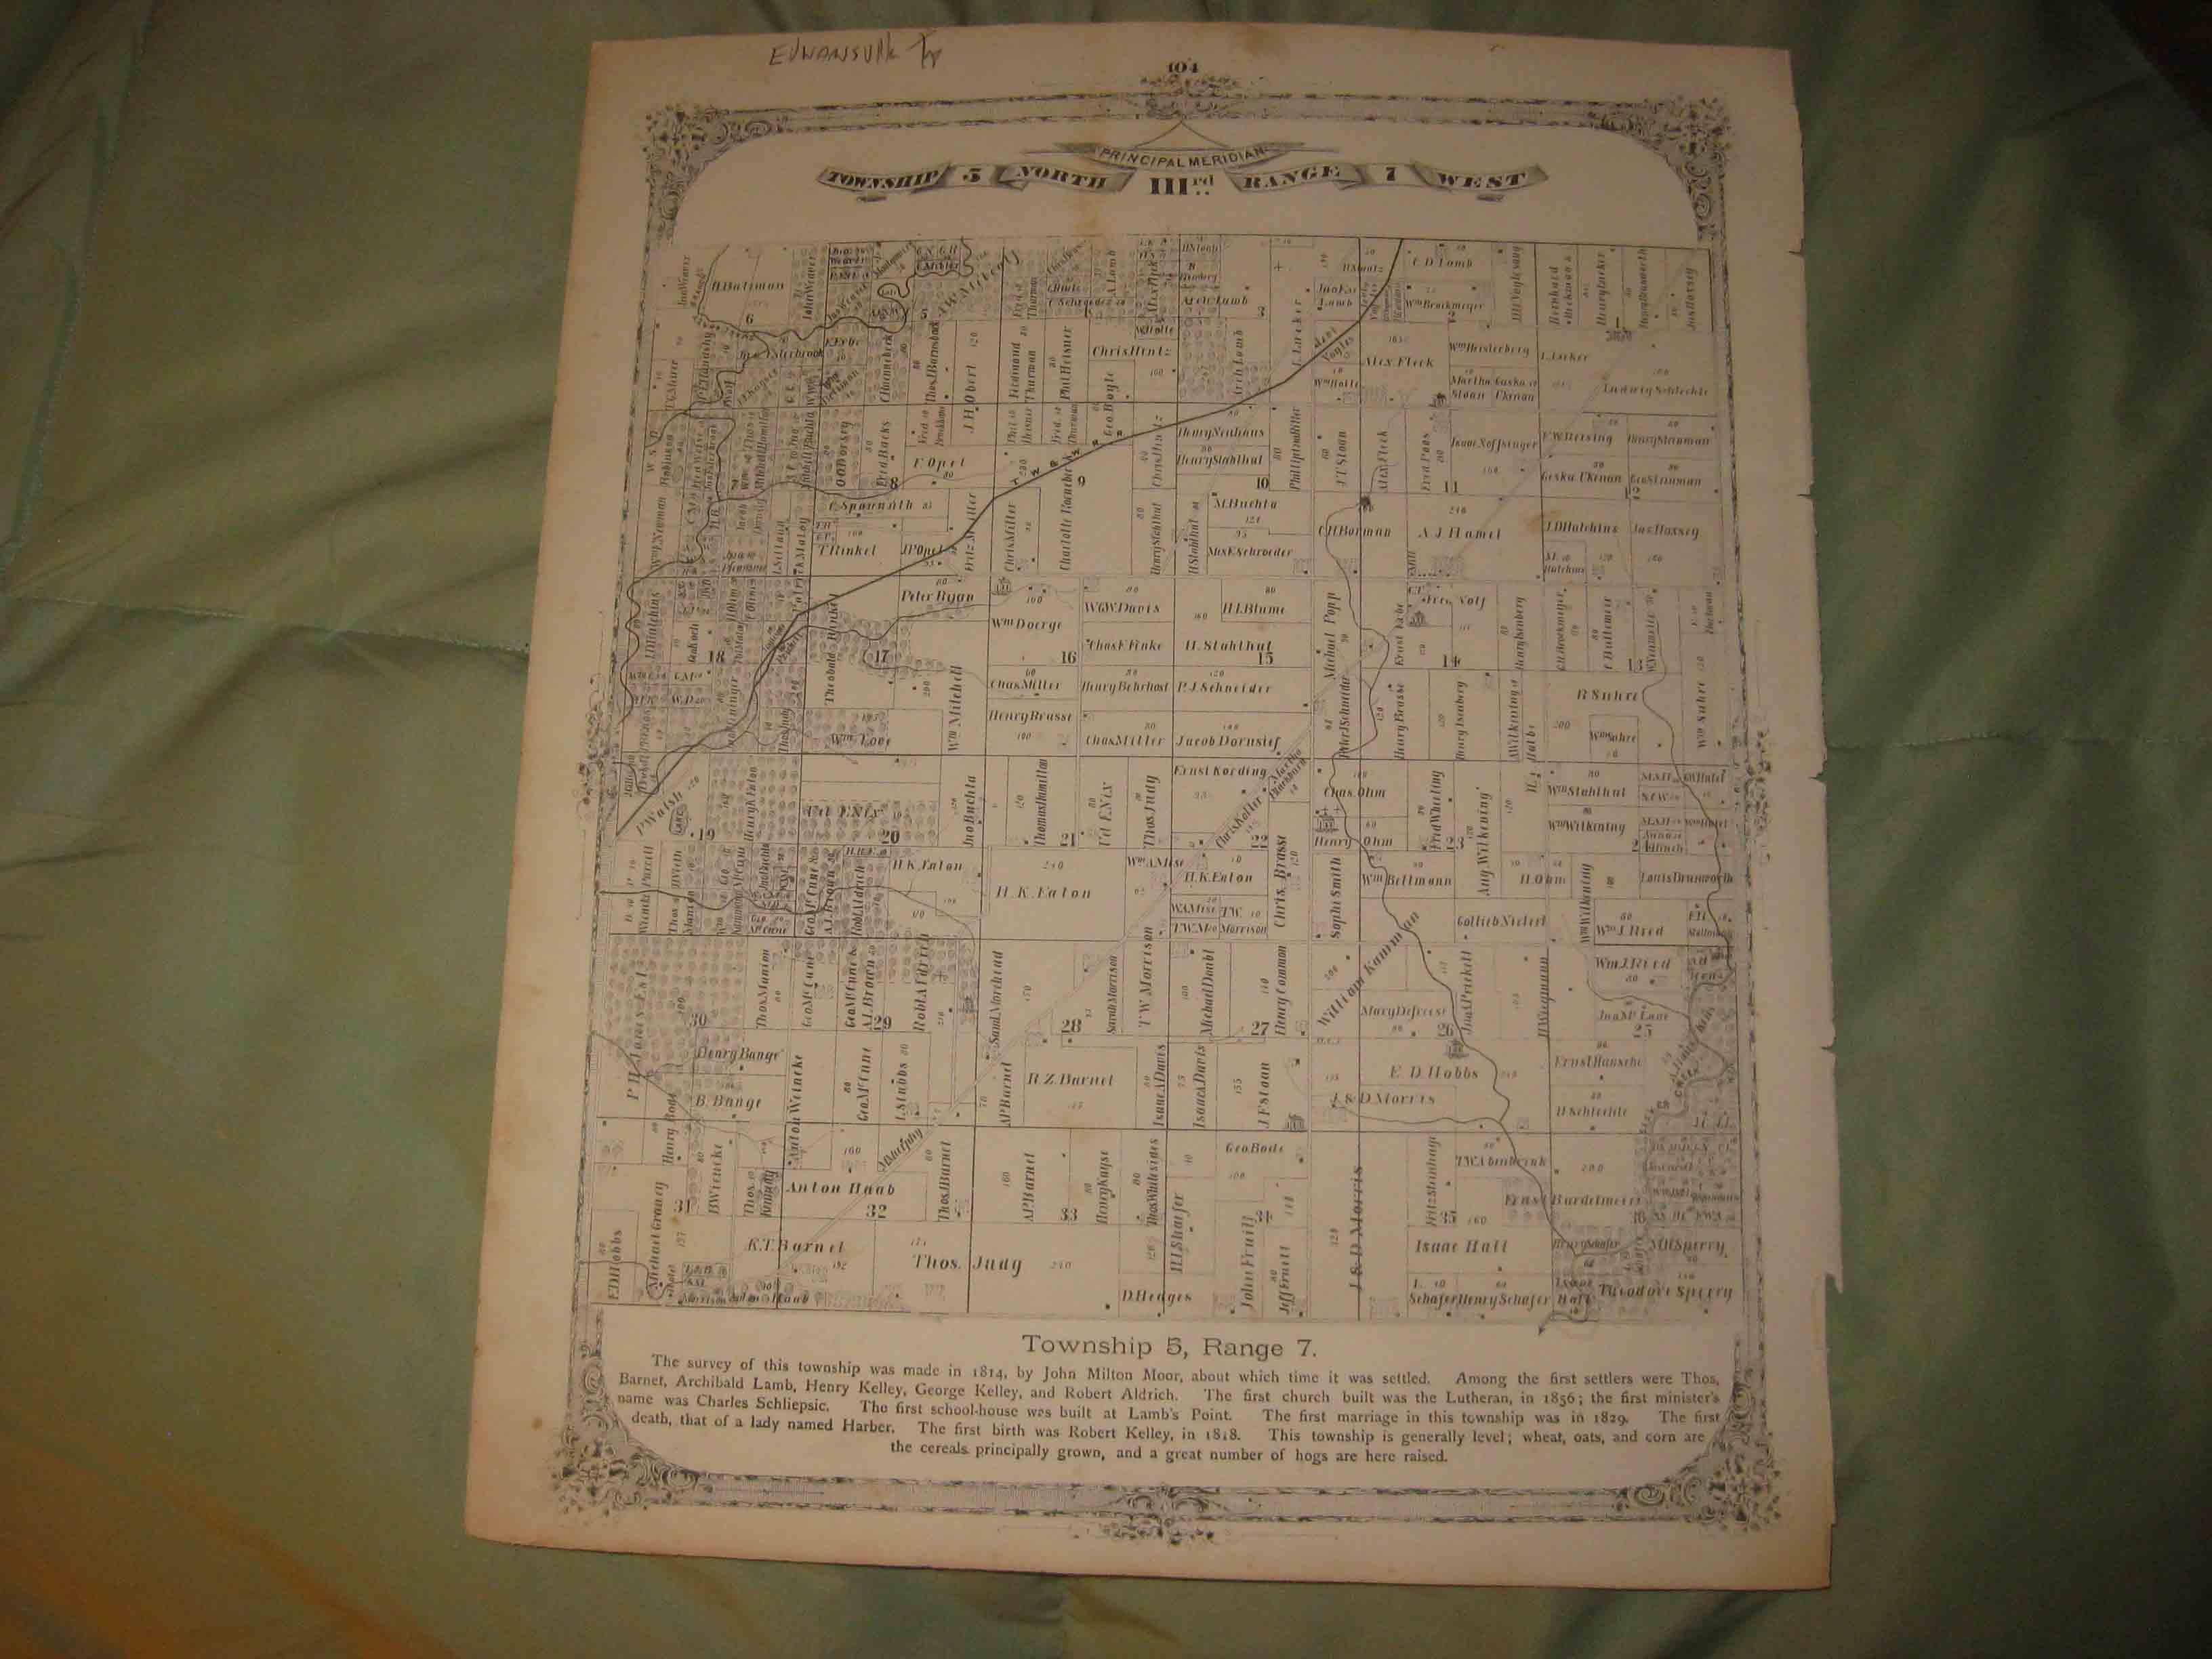 Antique 1873 Edwardsville Township Madison County Illinois Map